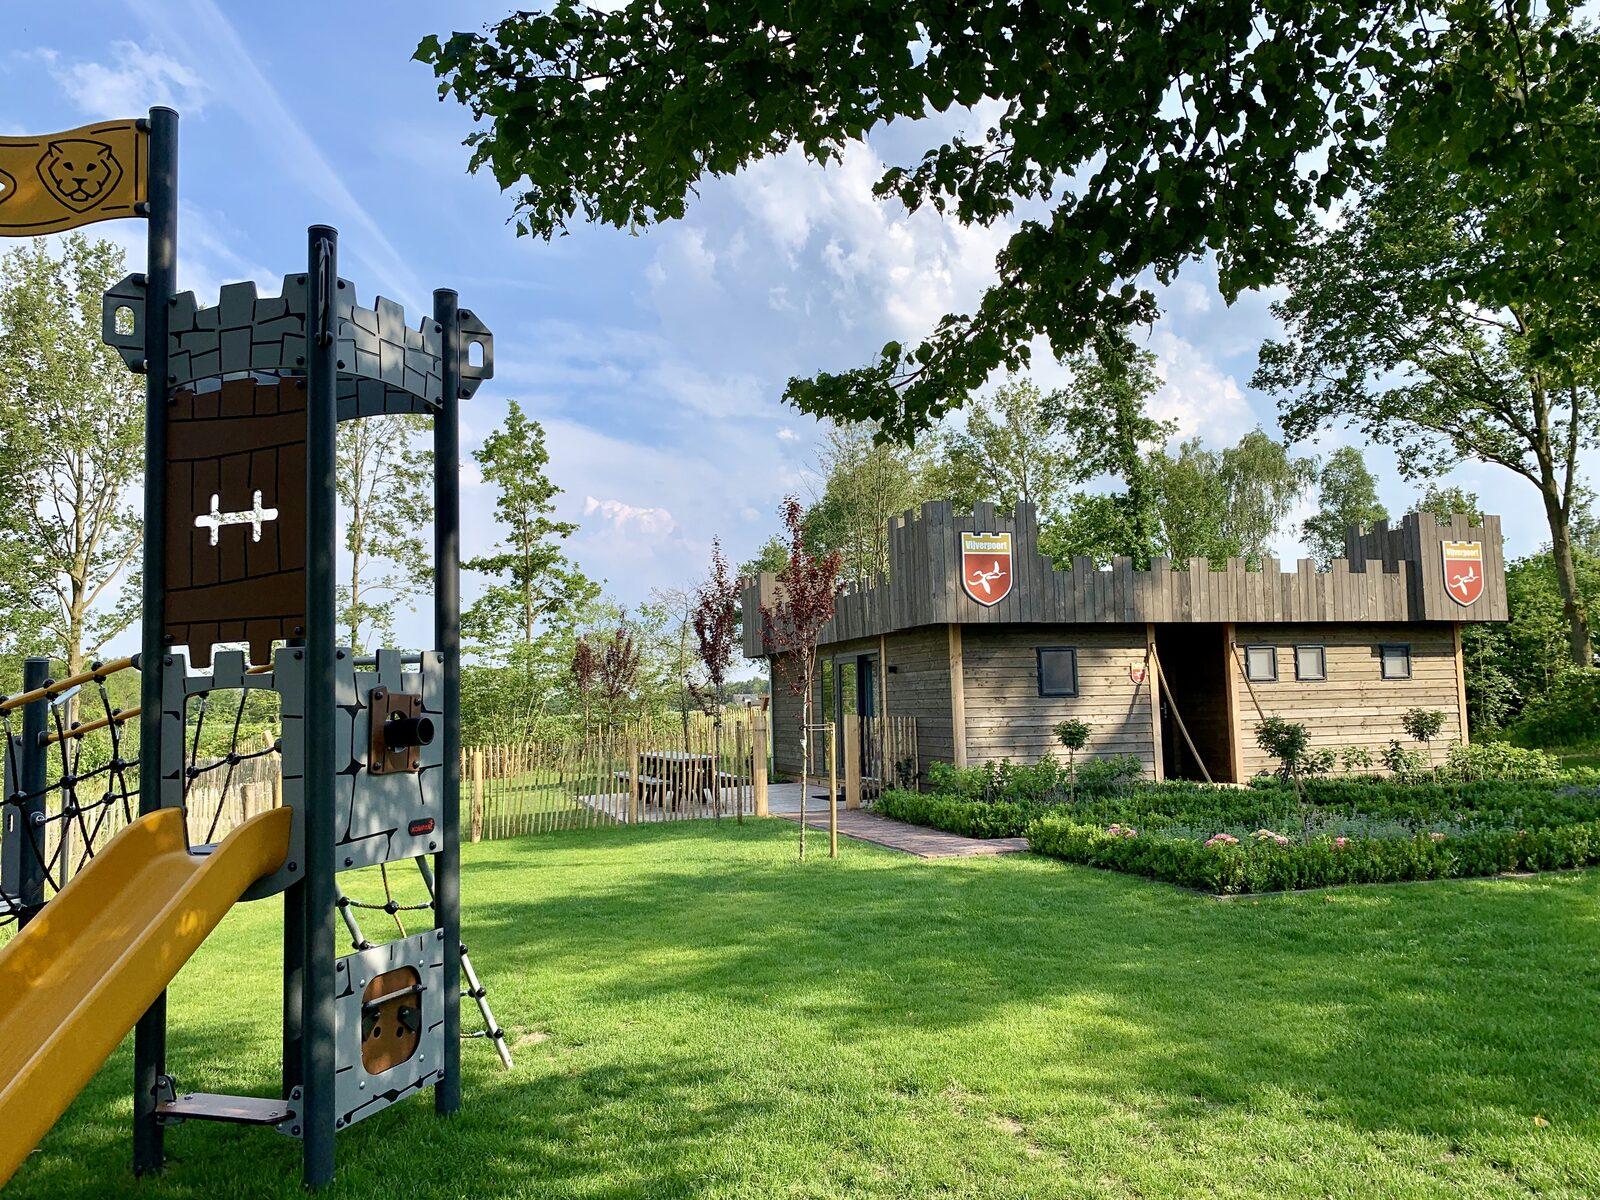 Kasteelovernachting in Nederland